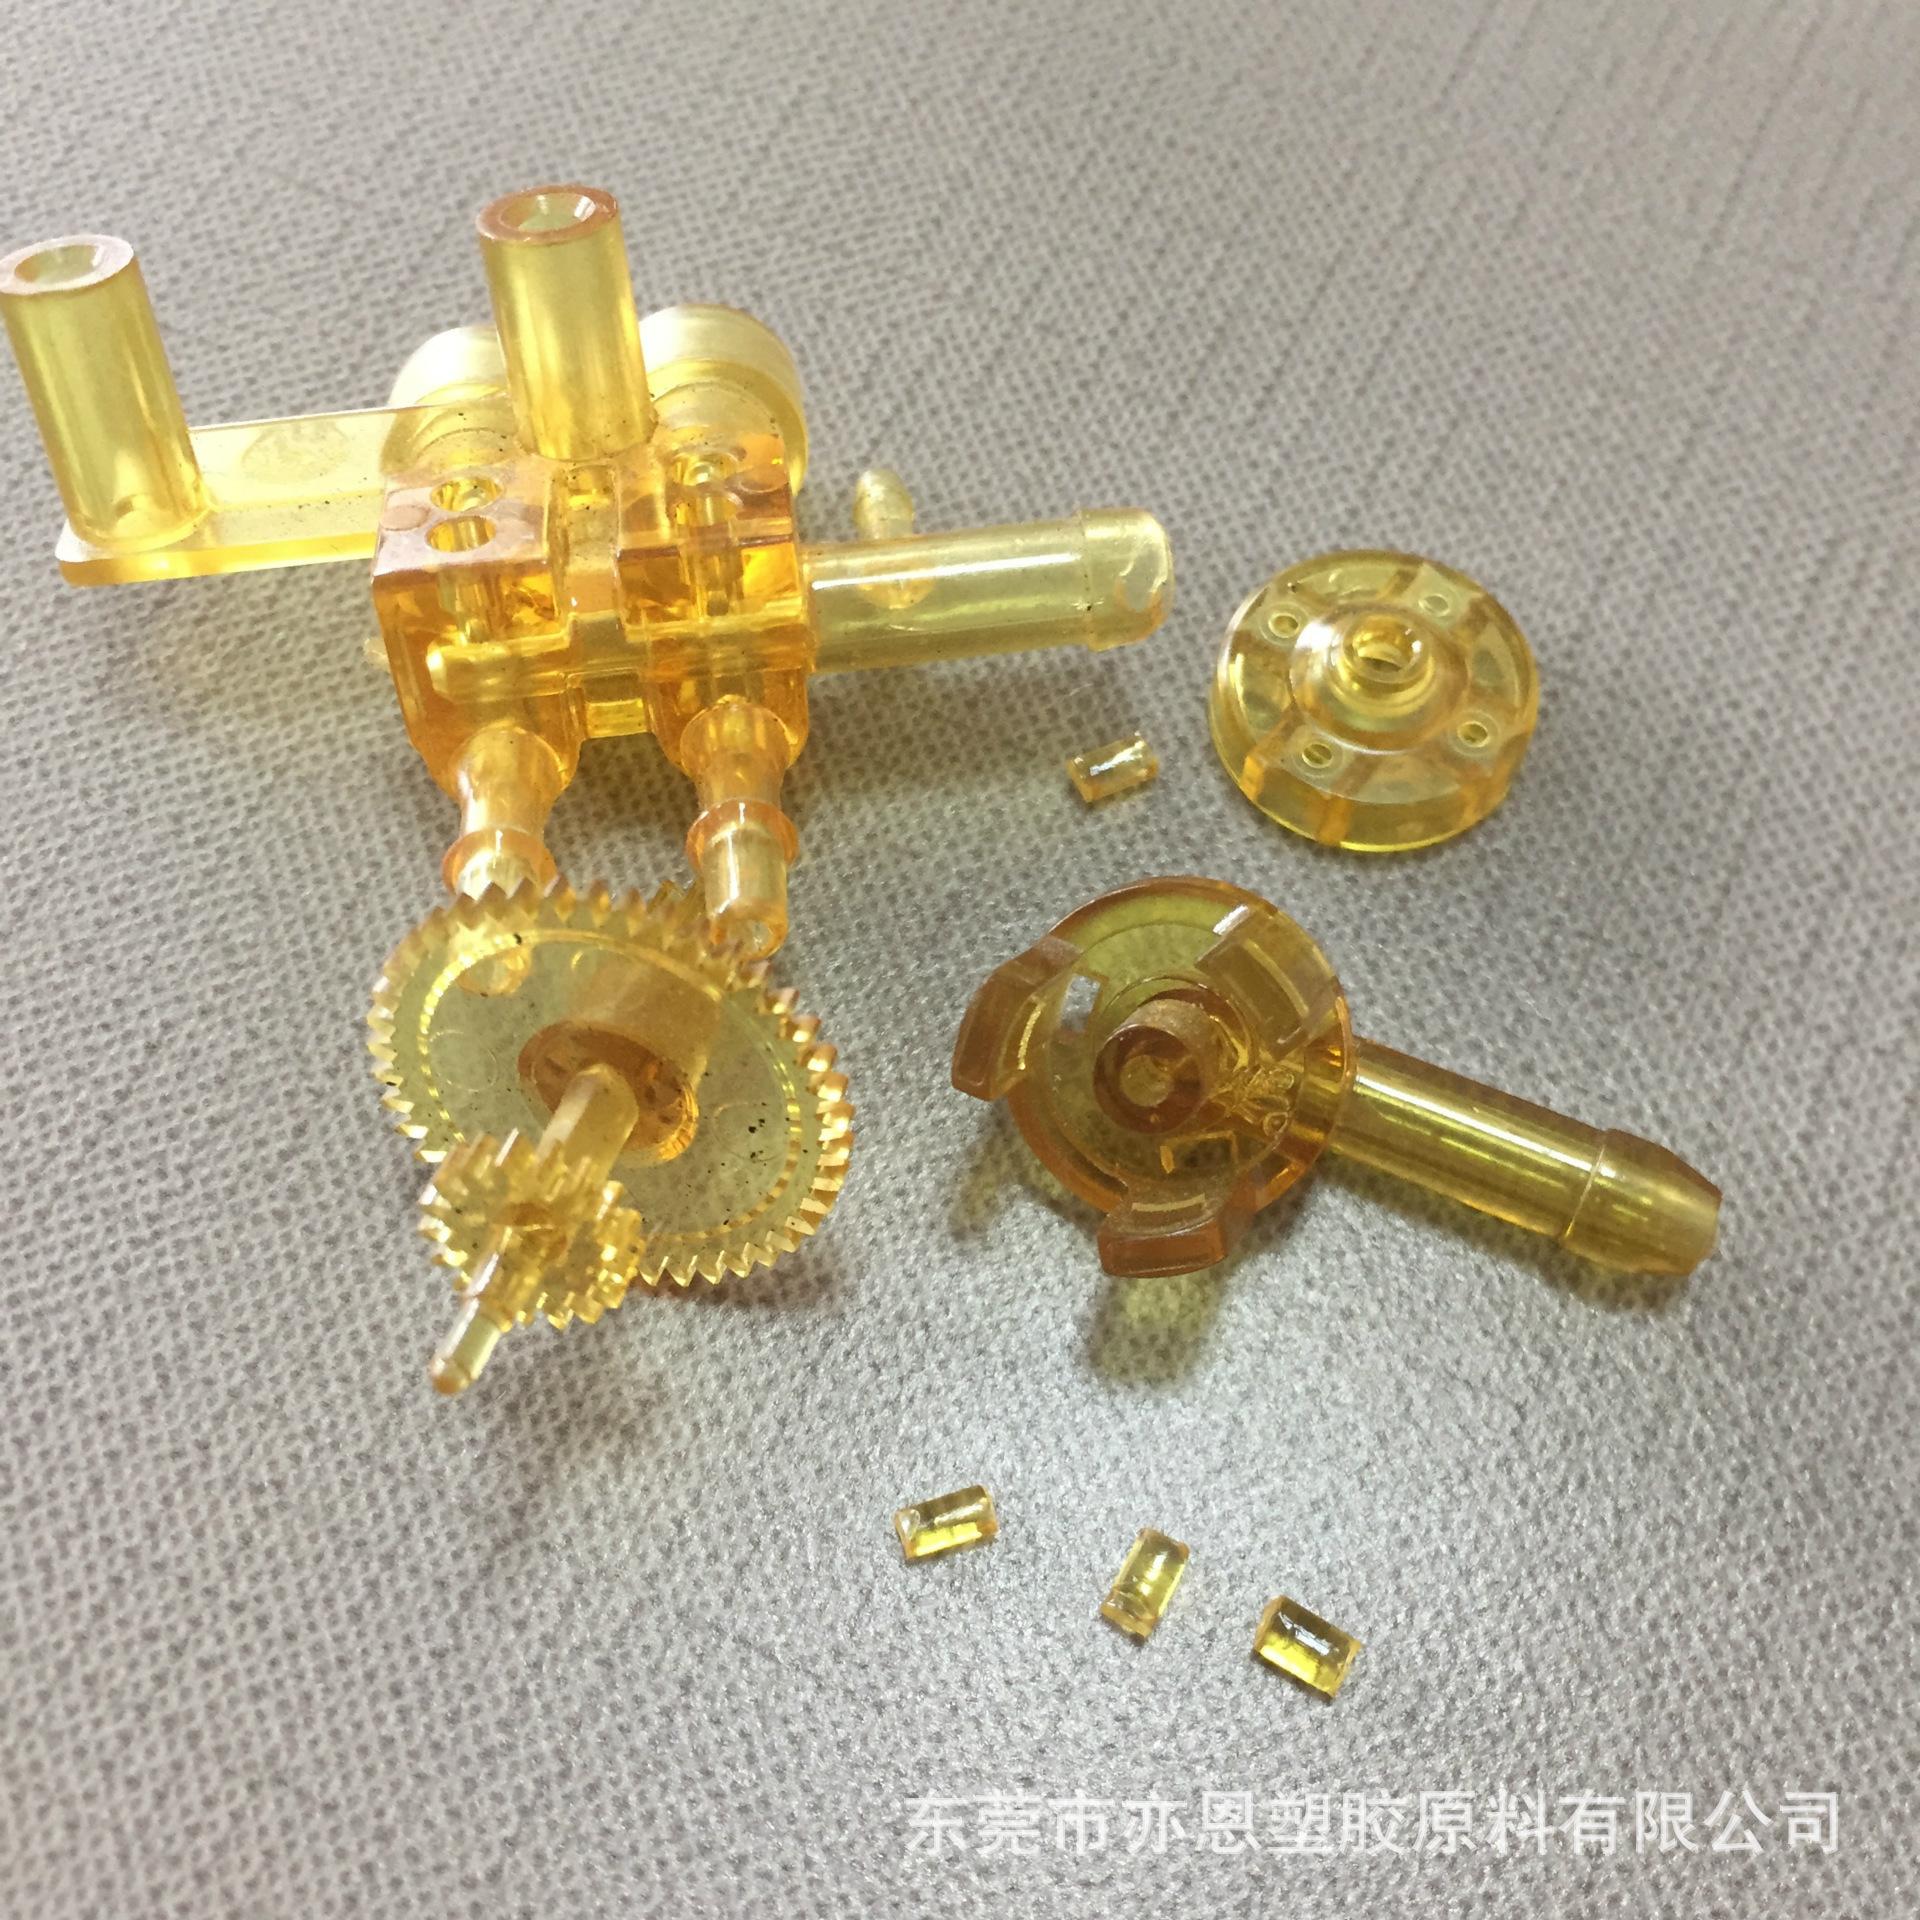 PEI报价/沙伯基础(原GE)/2100-1000厂家 供应商 电话pei塑料厂